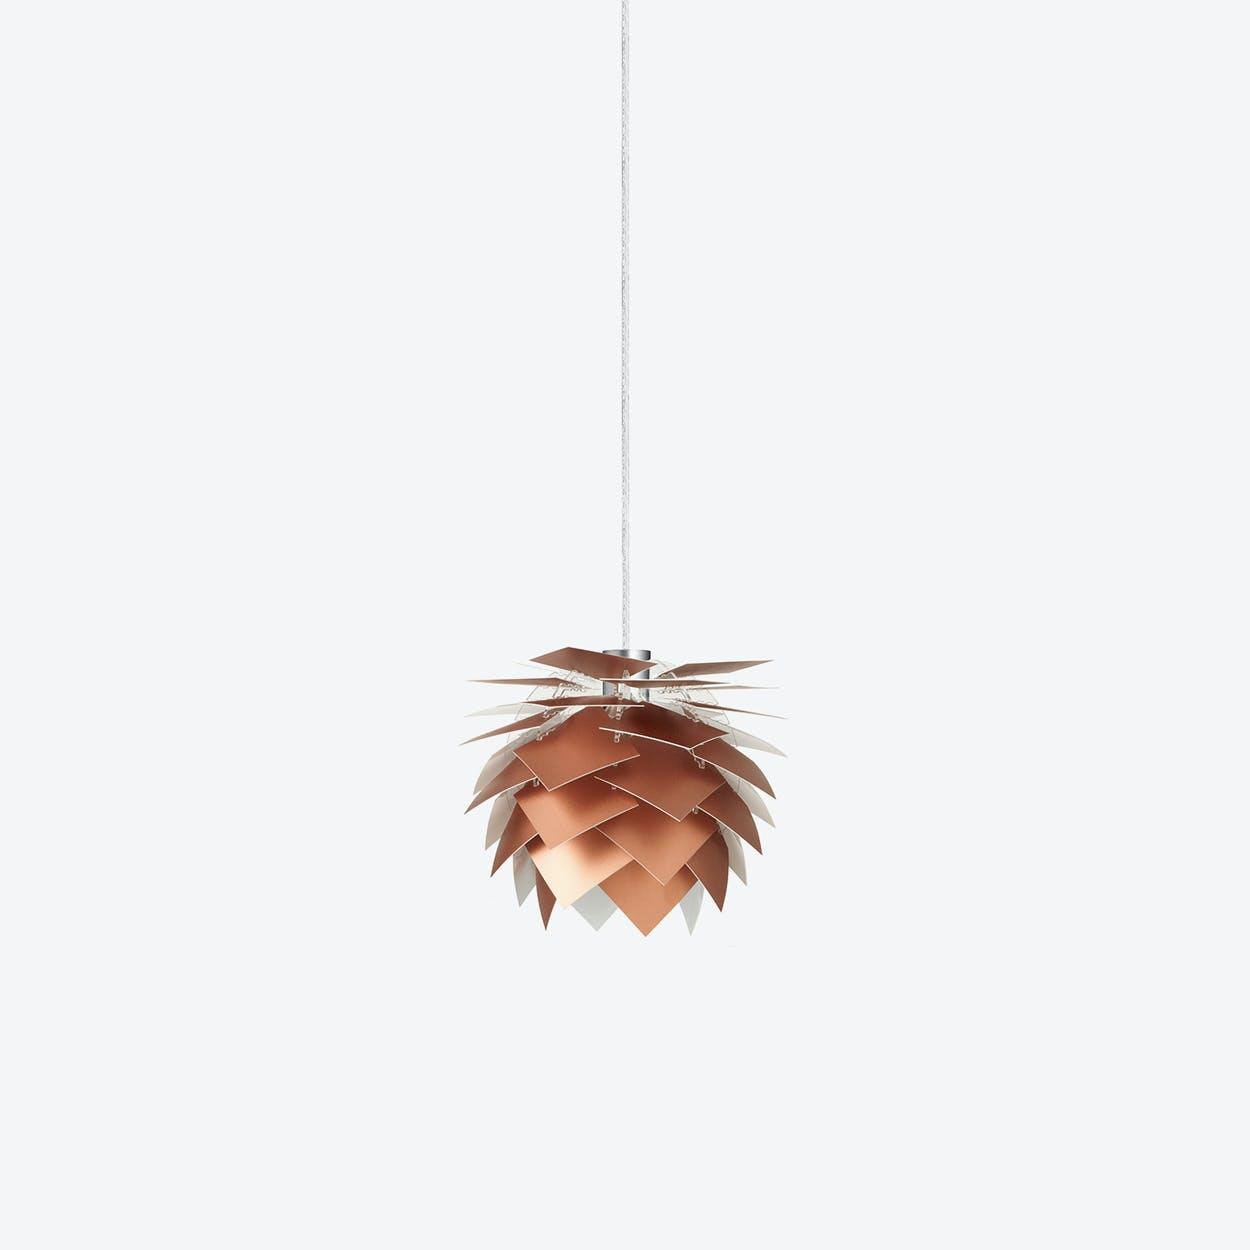 XS PineApple Pendant Lamp in Copper Look